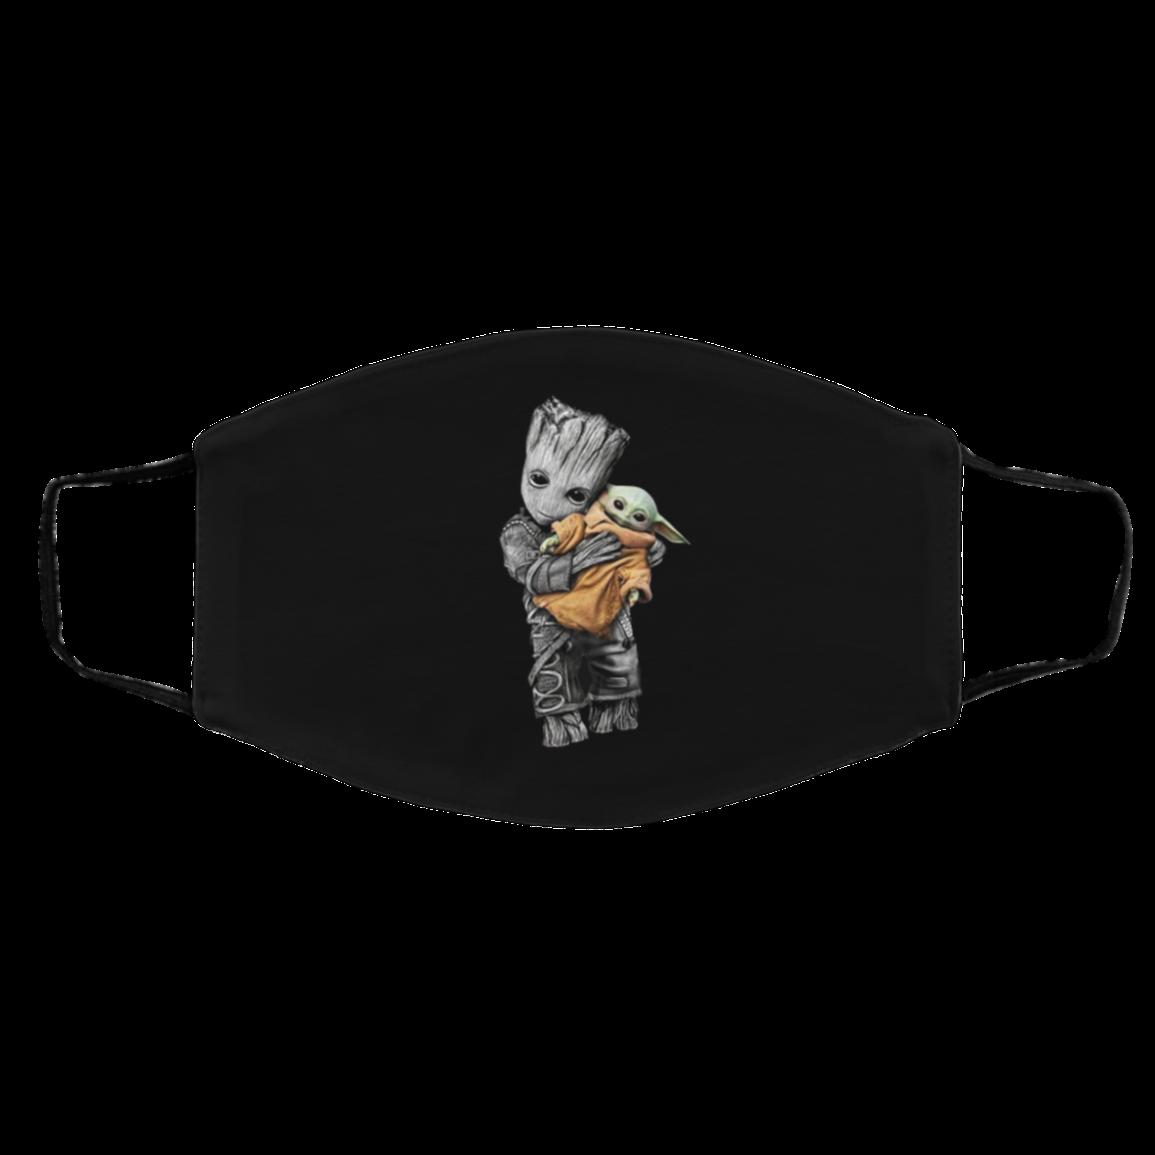 Baby Gro-ot Hug Ba-by Yoda Face Mask Gift For Fans